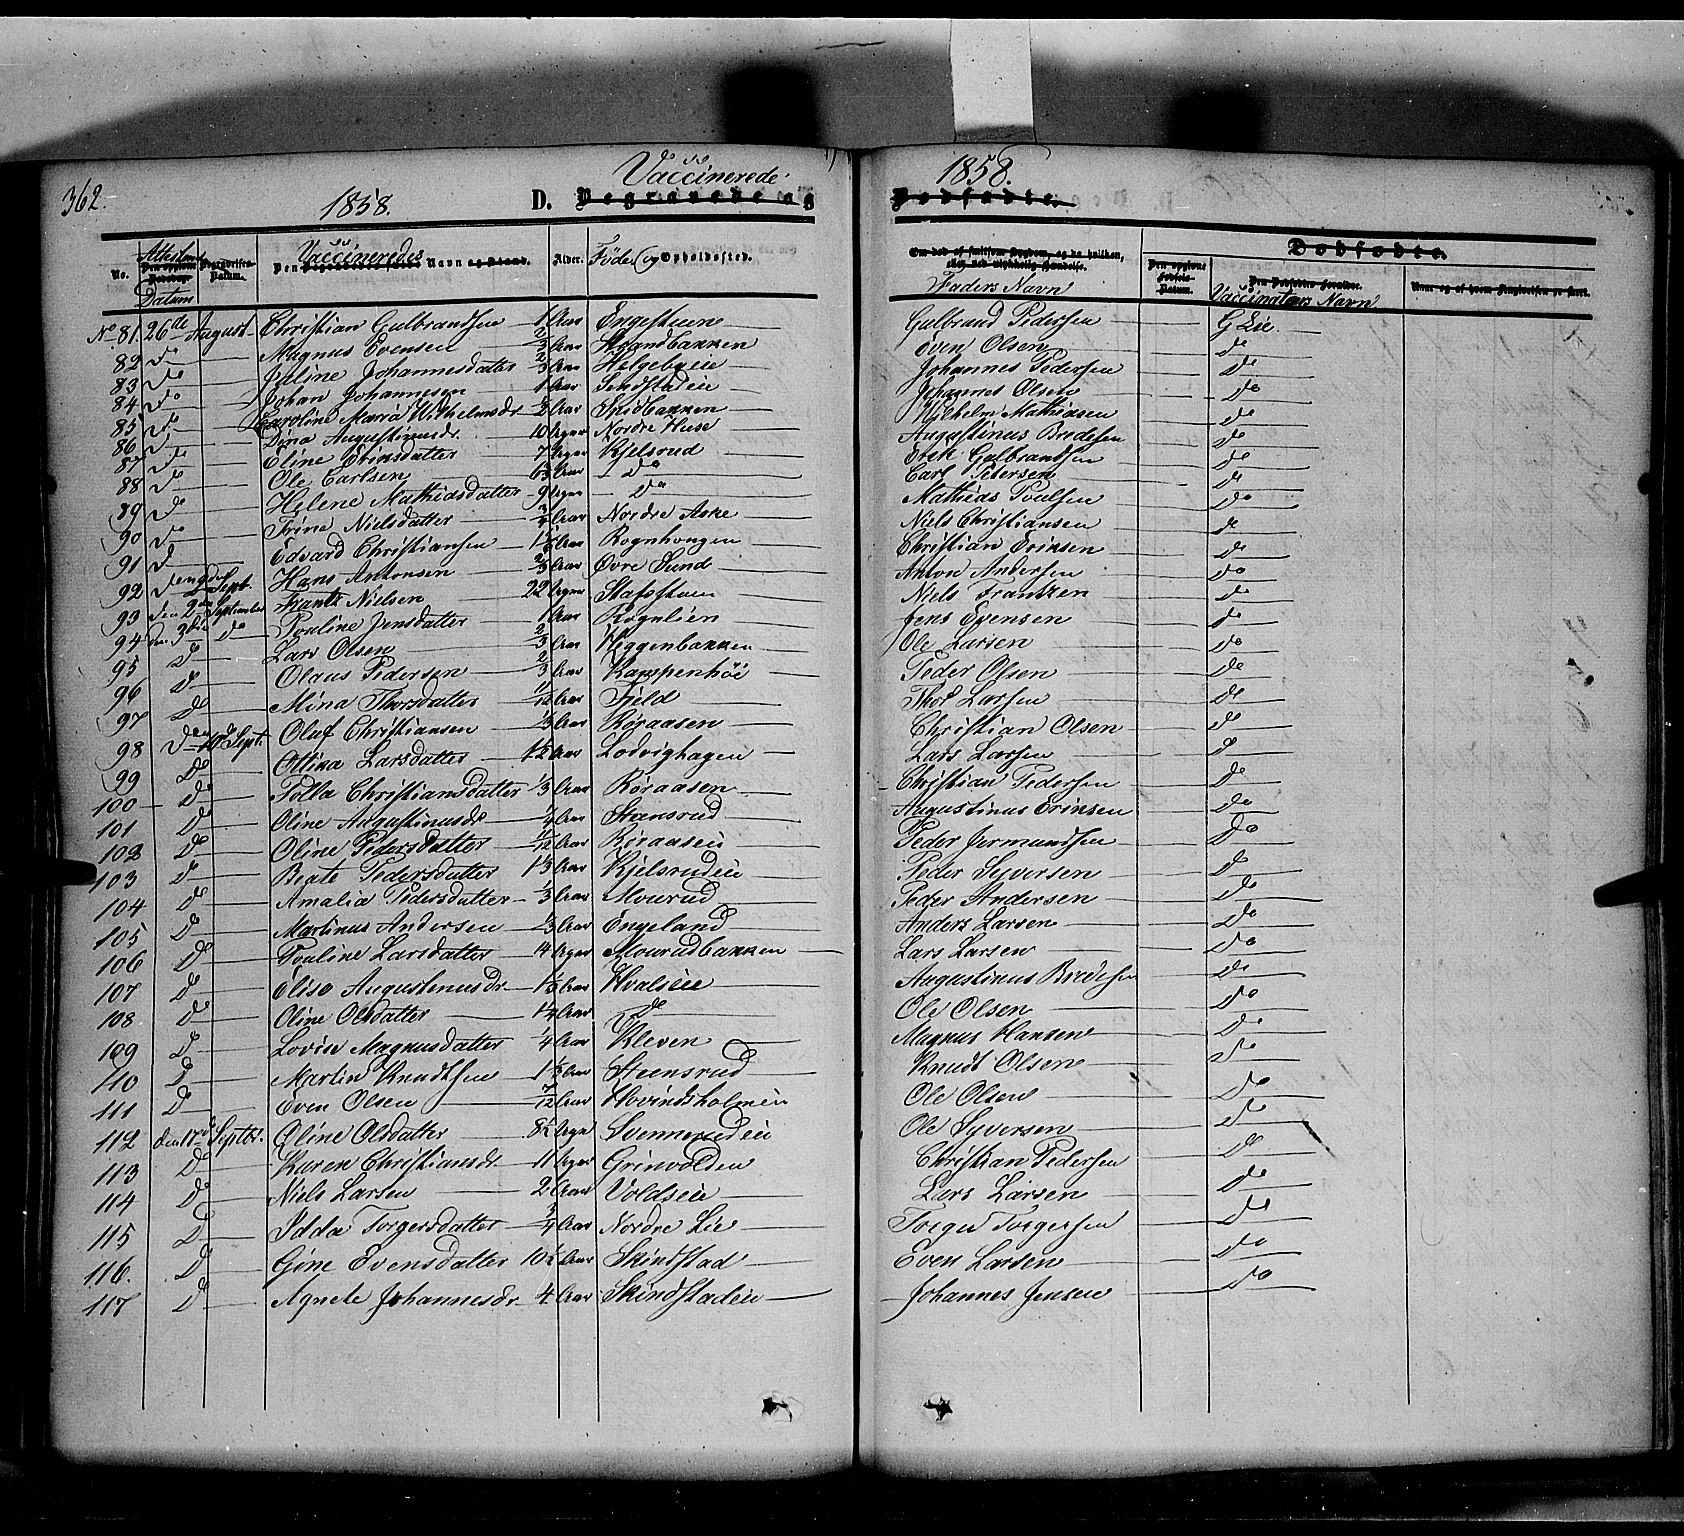 SAH, Nes prestekontor, K/Ka/L0004: Ministerialbok nr. 4, 1852-1886, s. 362